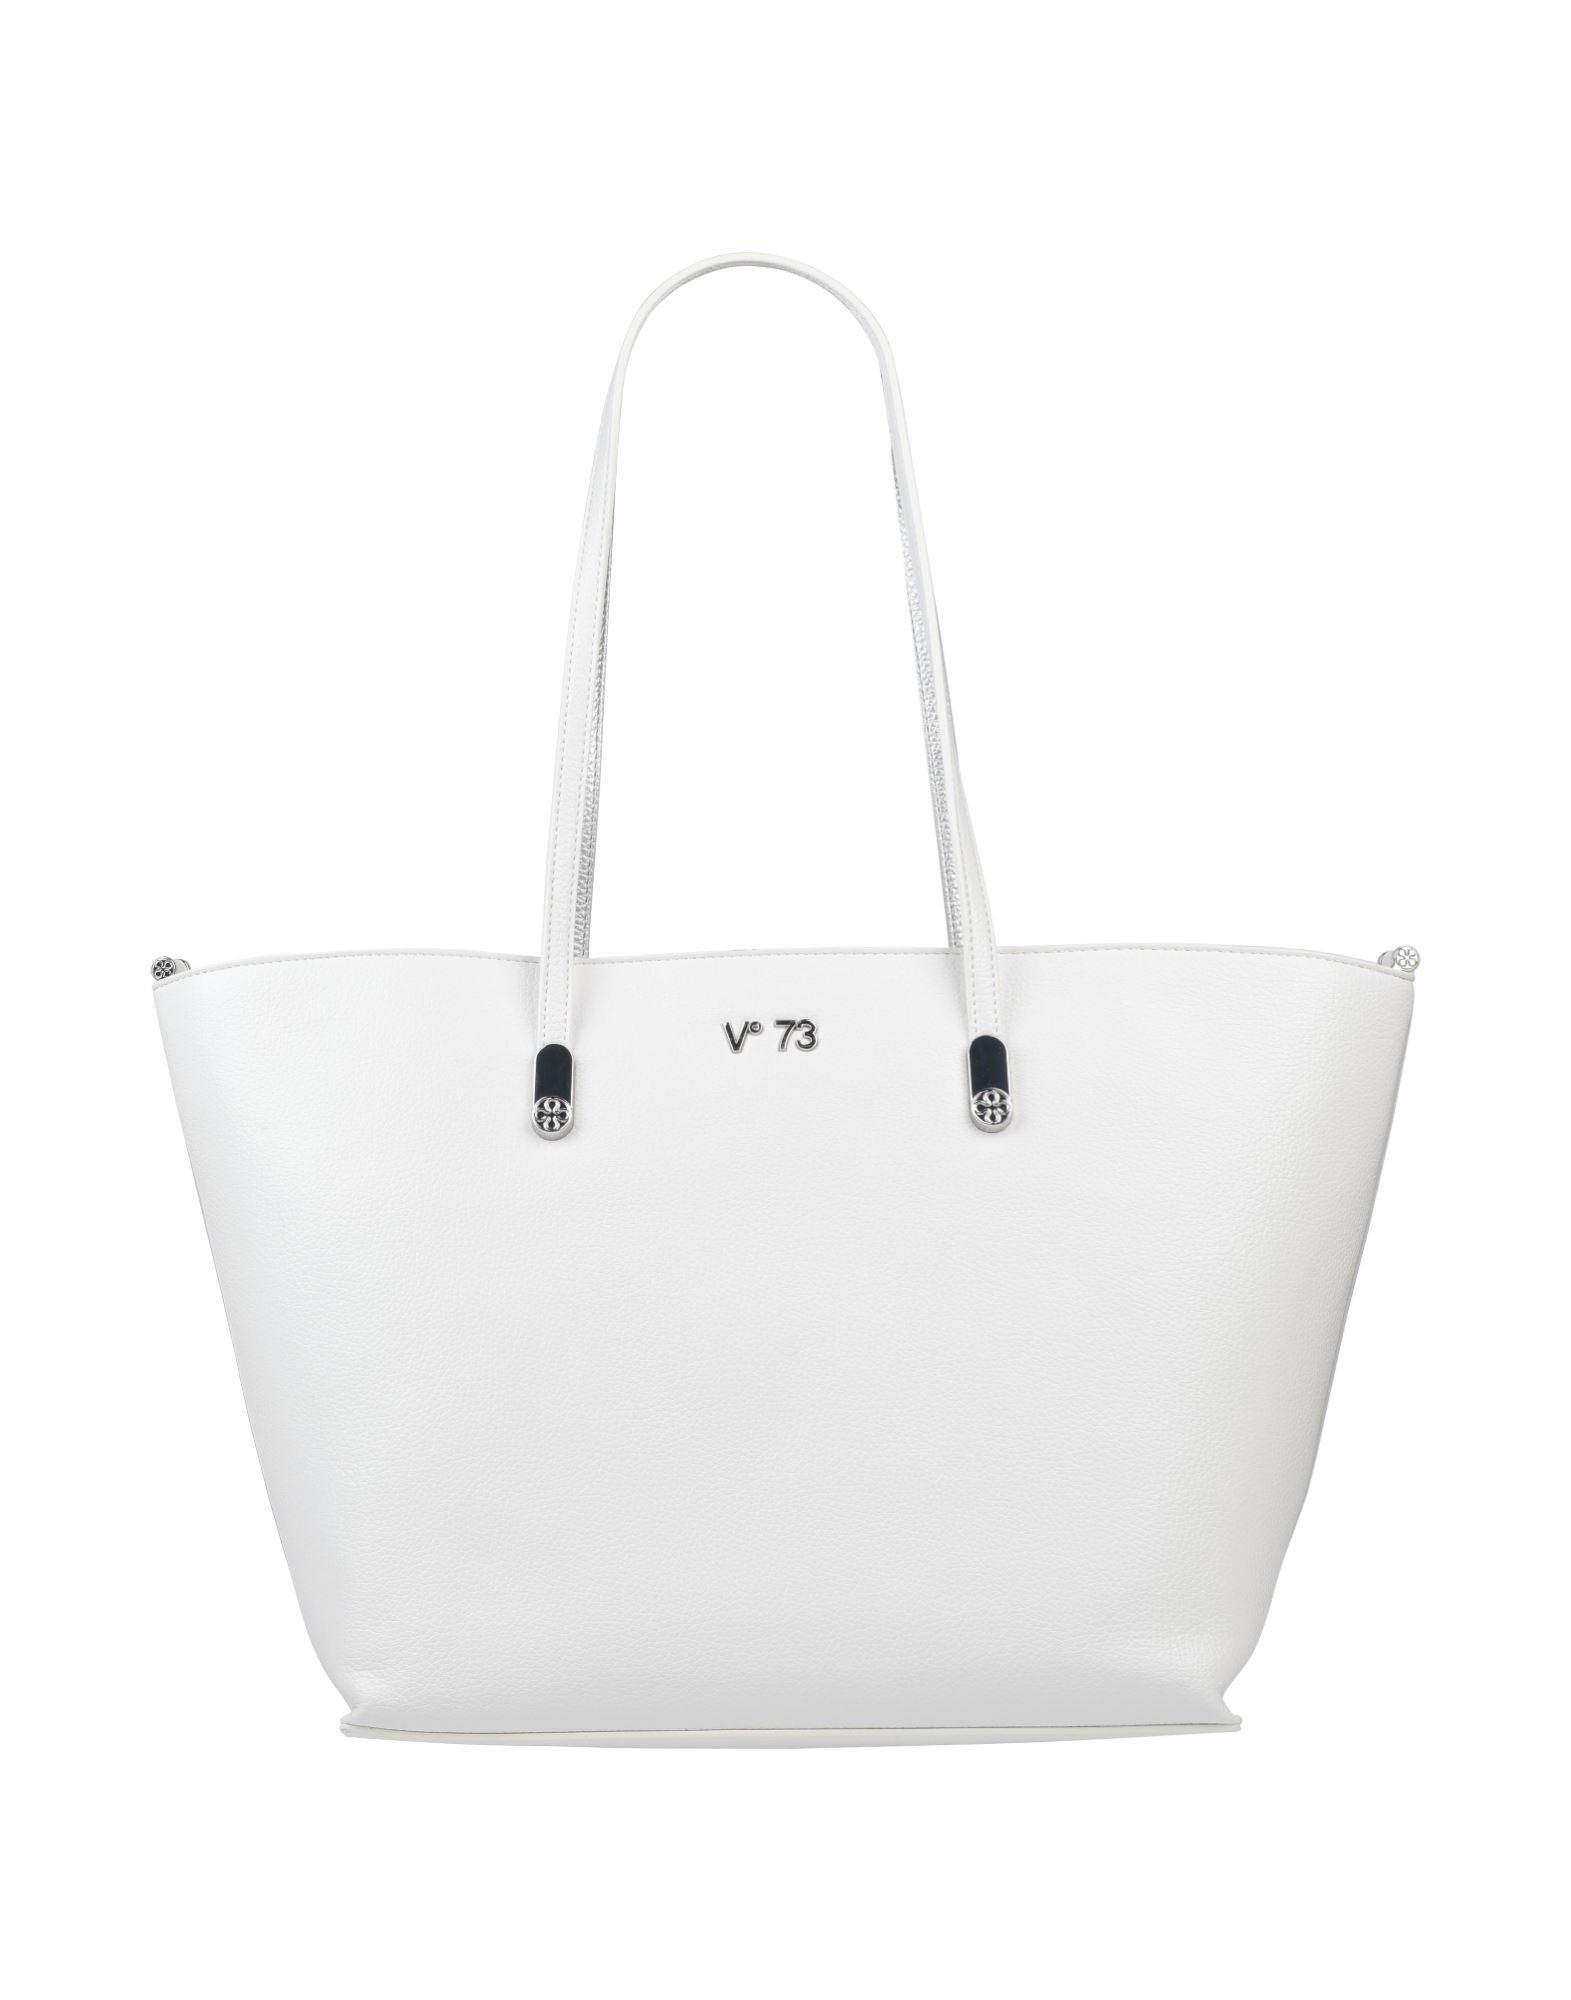 Vdegree73 Shoulder bags - Item 45556188